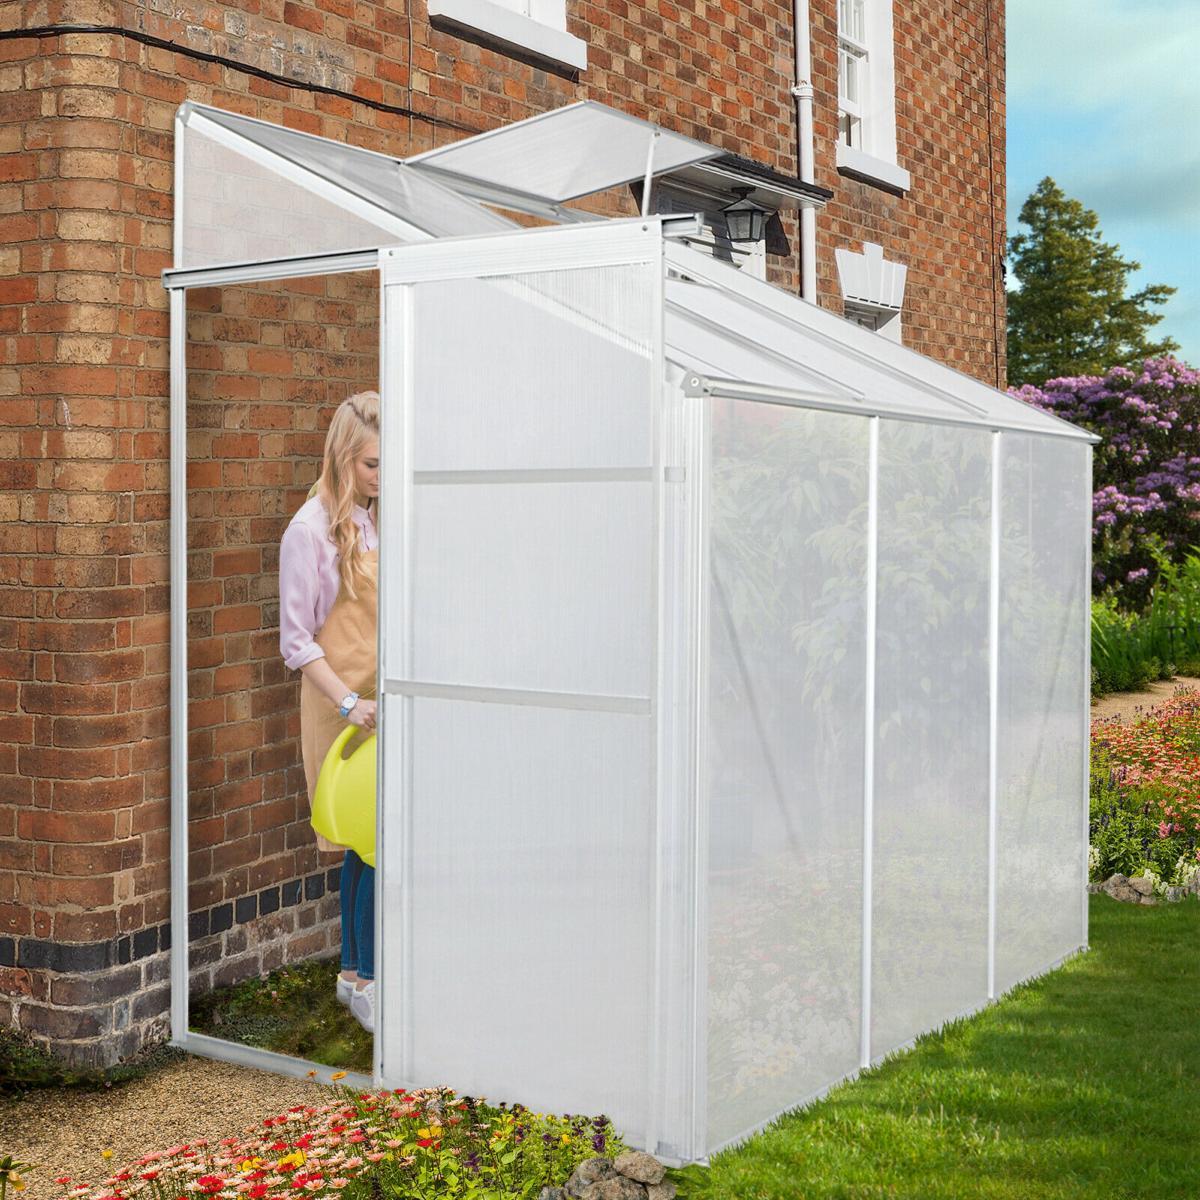 Serre De Jardin 2,3 M² Abri Abri, Adossable En Polycarbonate Aluminium avec Serre Adossable